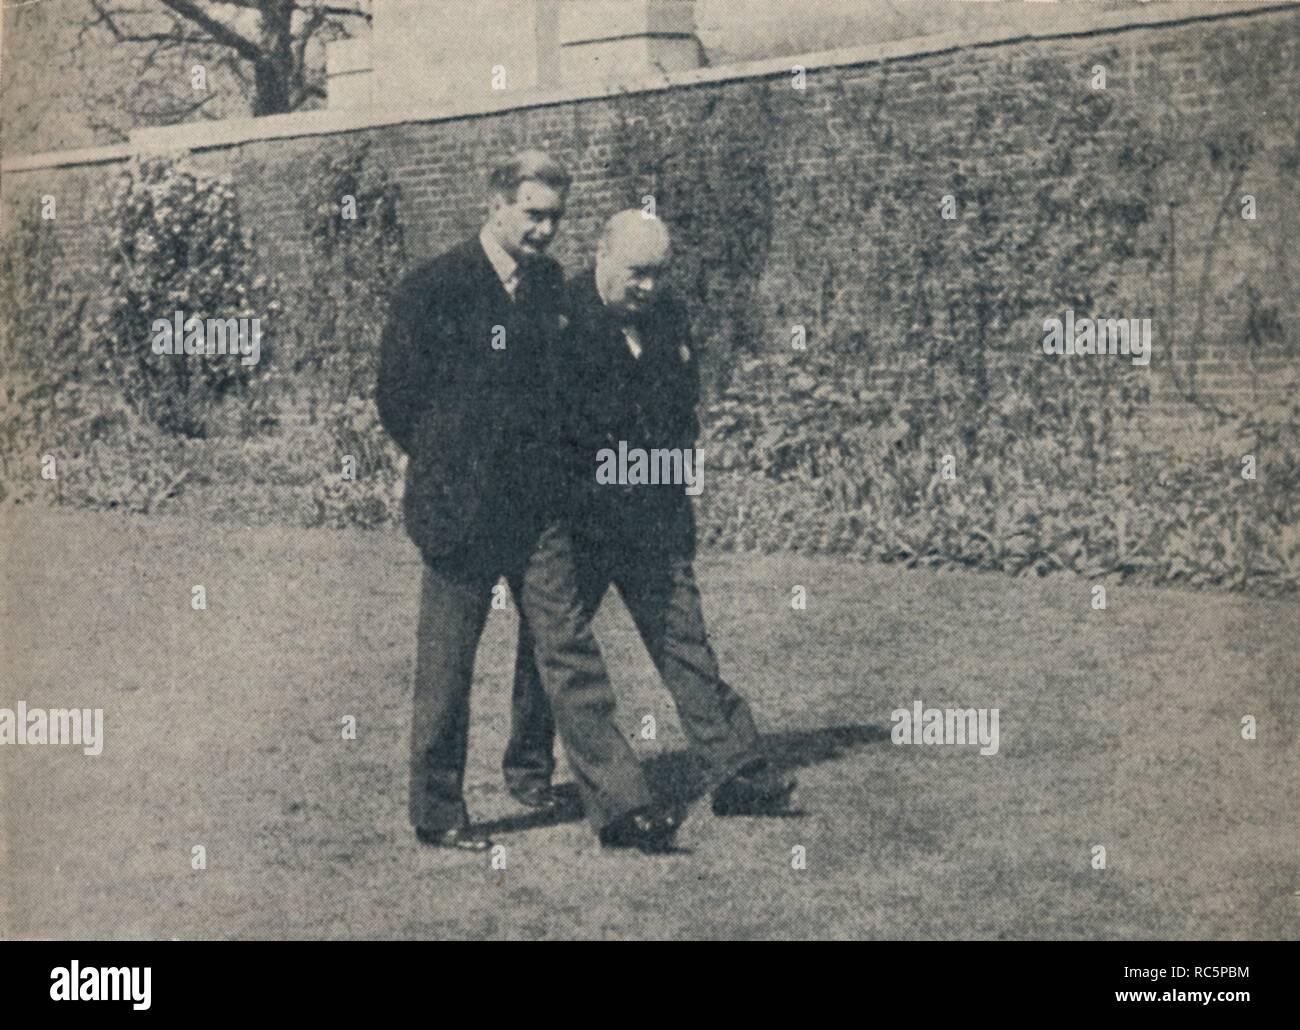 3ebecb286d60e The Prime Minister Sir Anthony Eden Stock Photos   The Prime ...